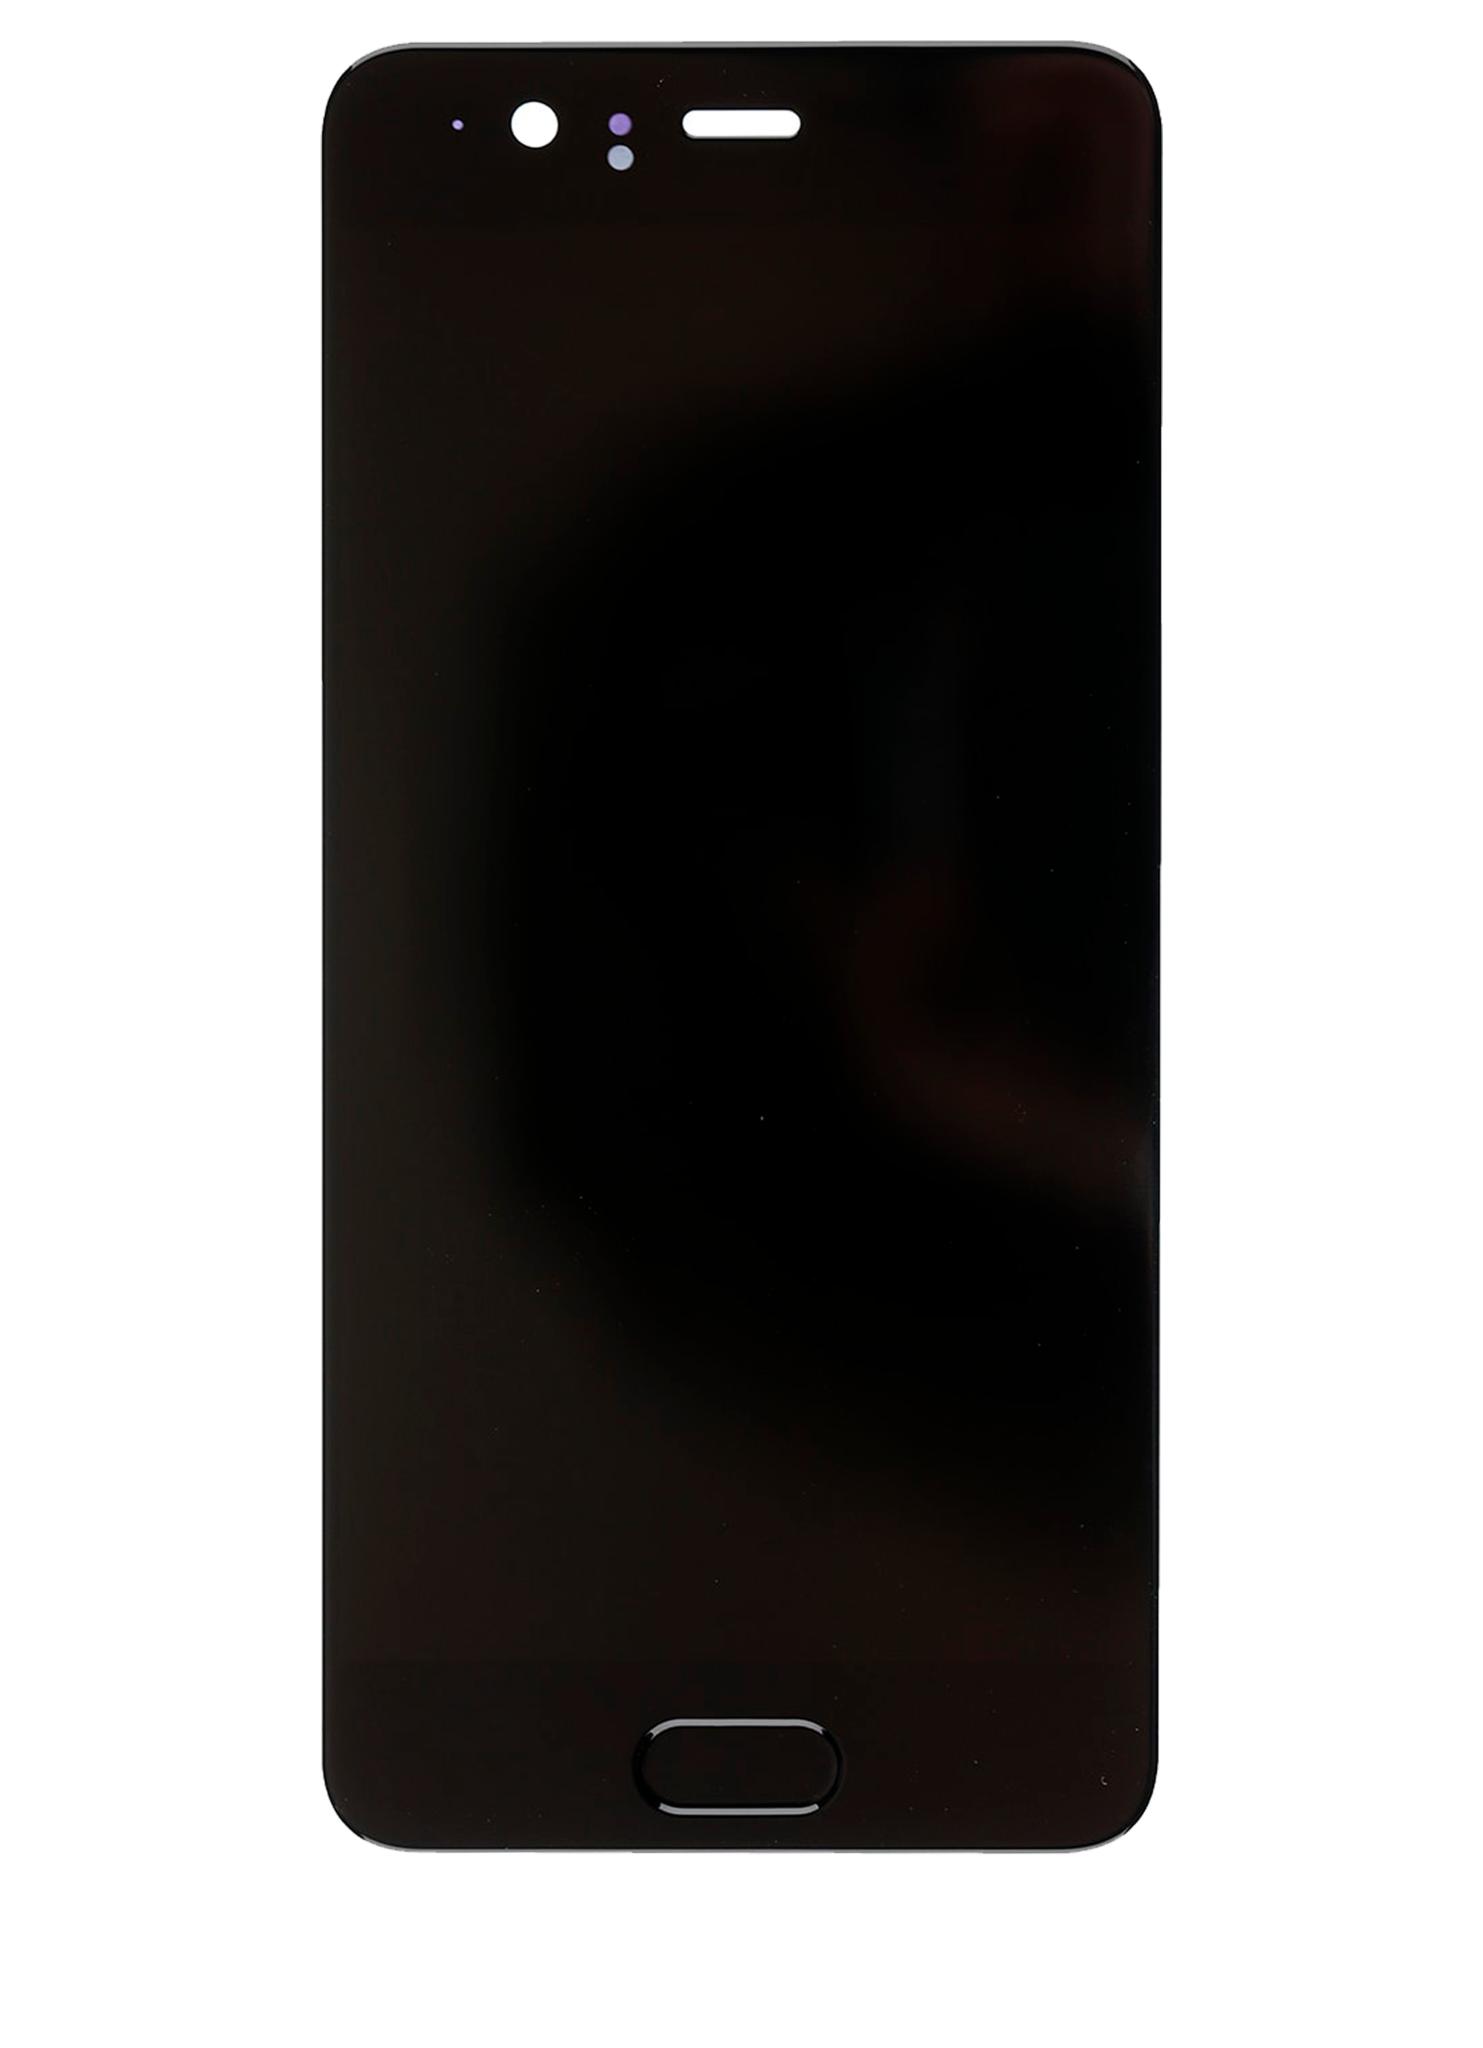 Huawei P10 VTR-L09 Display Module + Frame Black Original